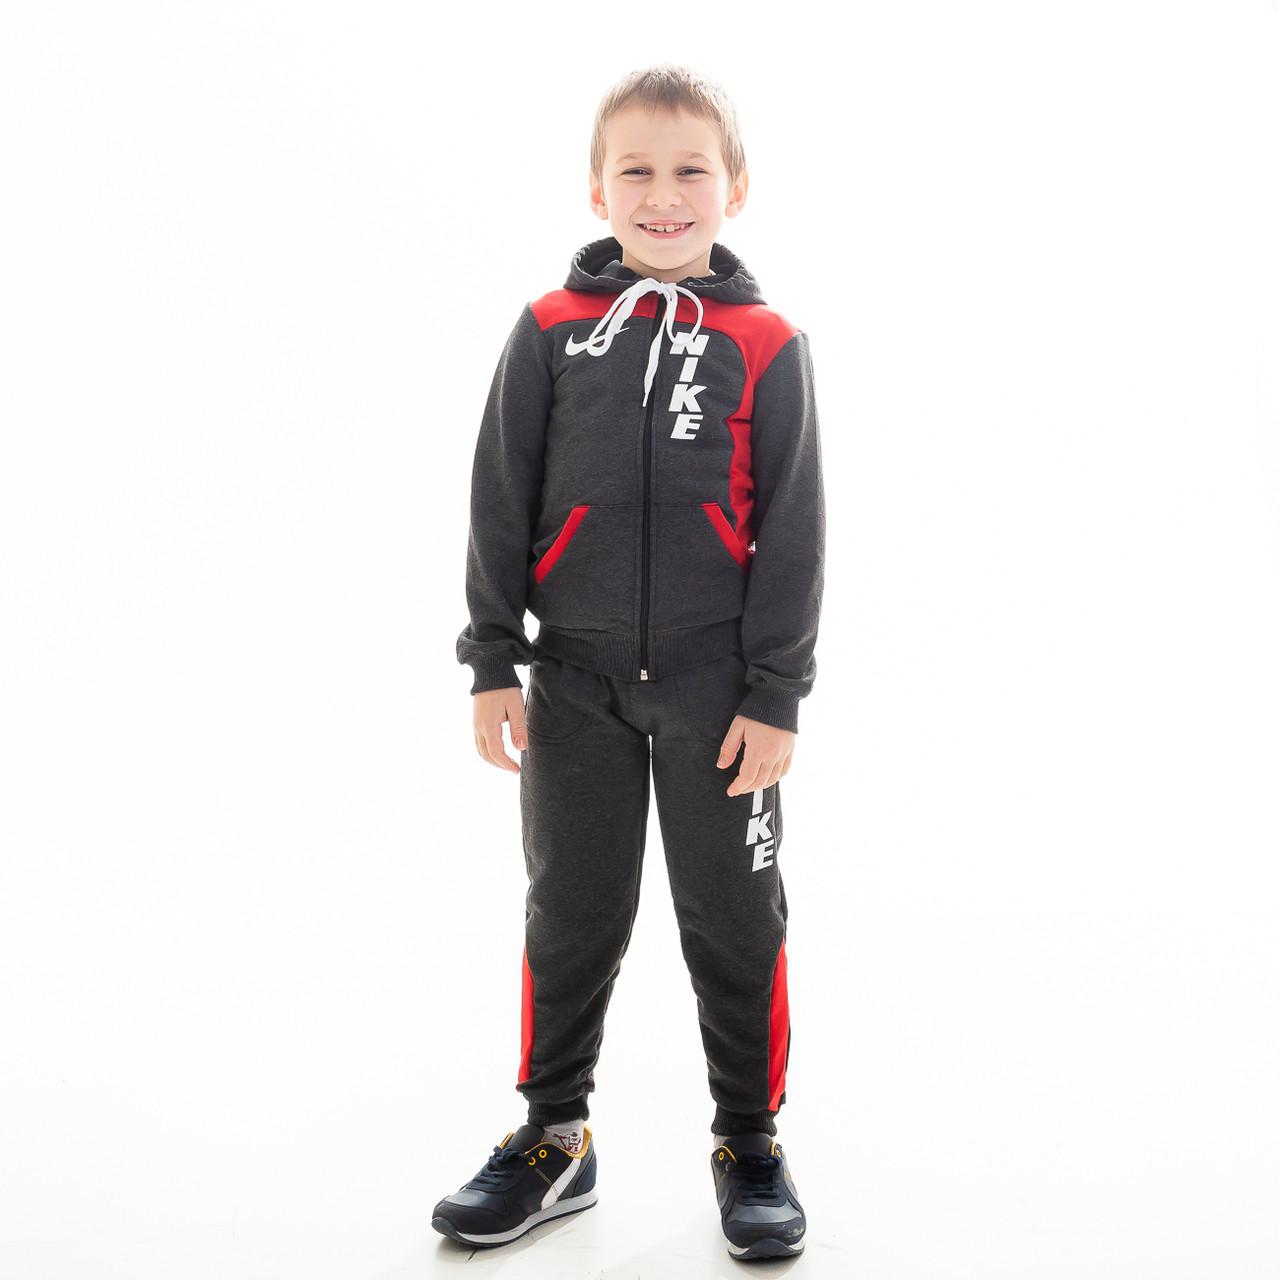 d16e710a Спортивный костюм для мальчика Nike: продажа, цена в Харькове ...